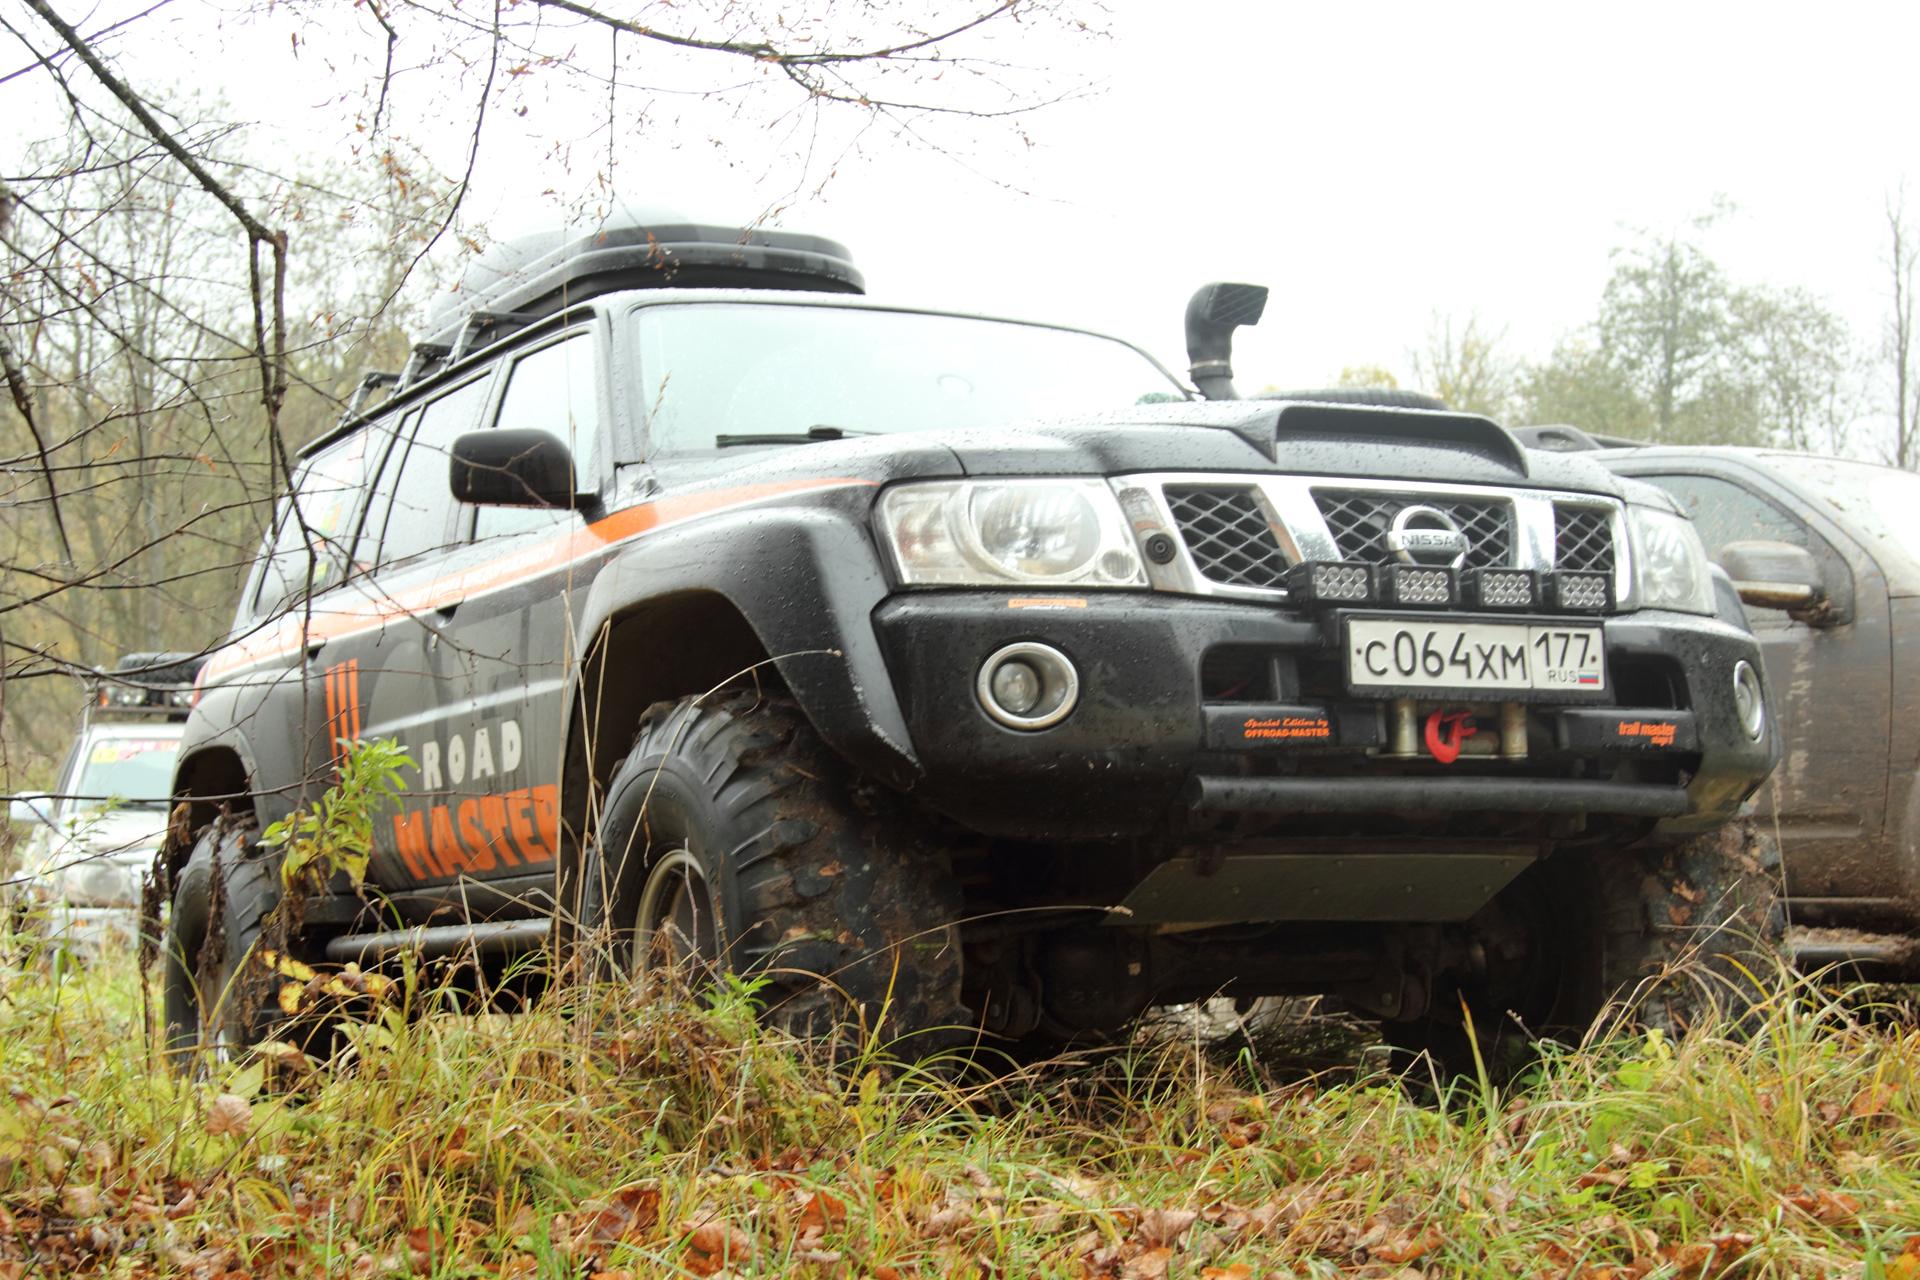 ISEA autoclubman 553